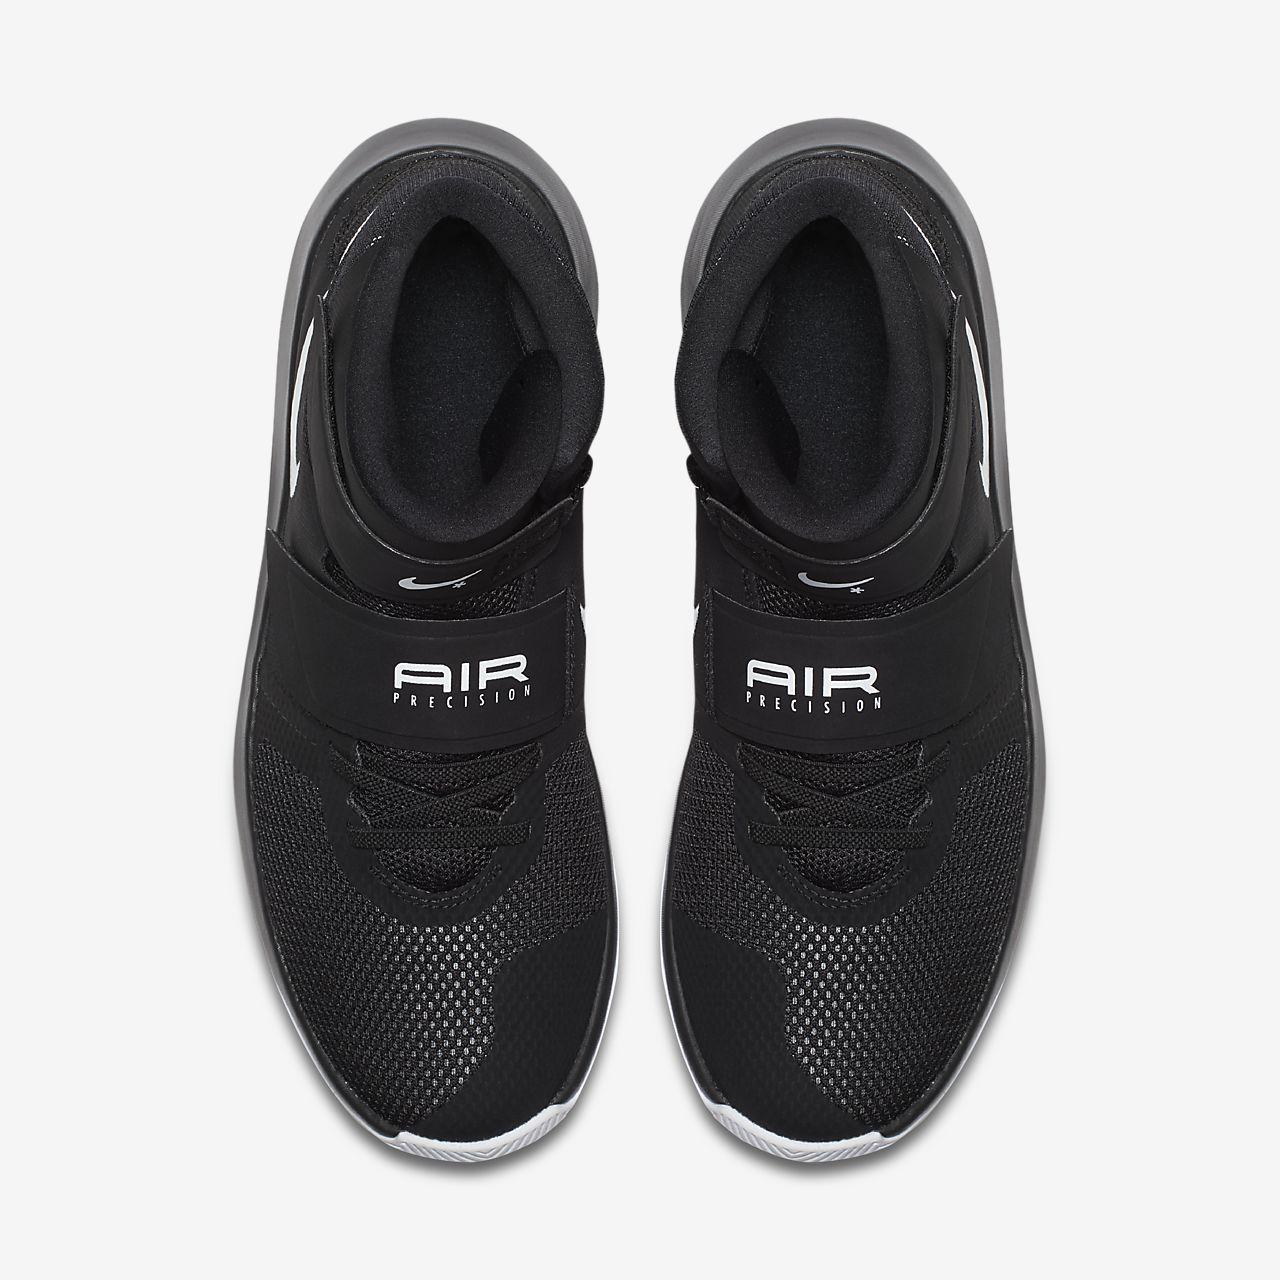 4a010978046 ... white pure platinum black  nike air precision flyease mens basketball  shoe